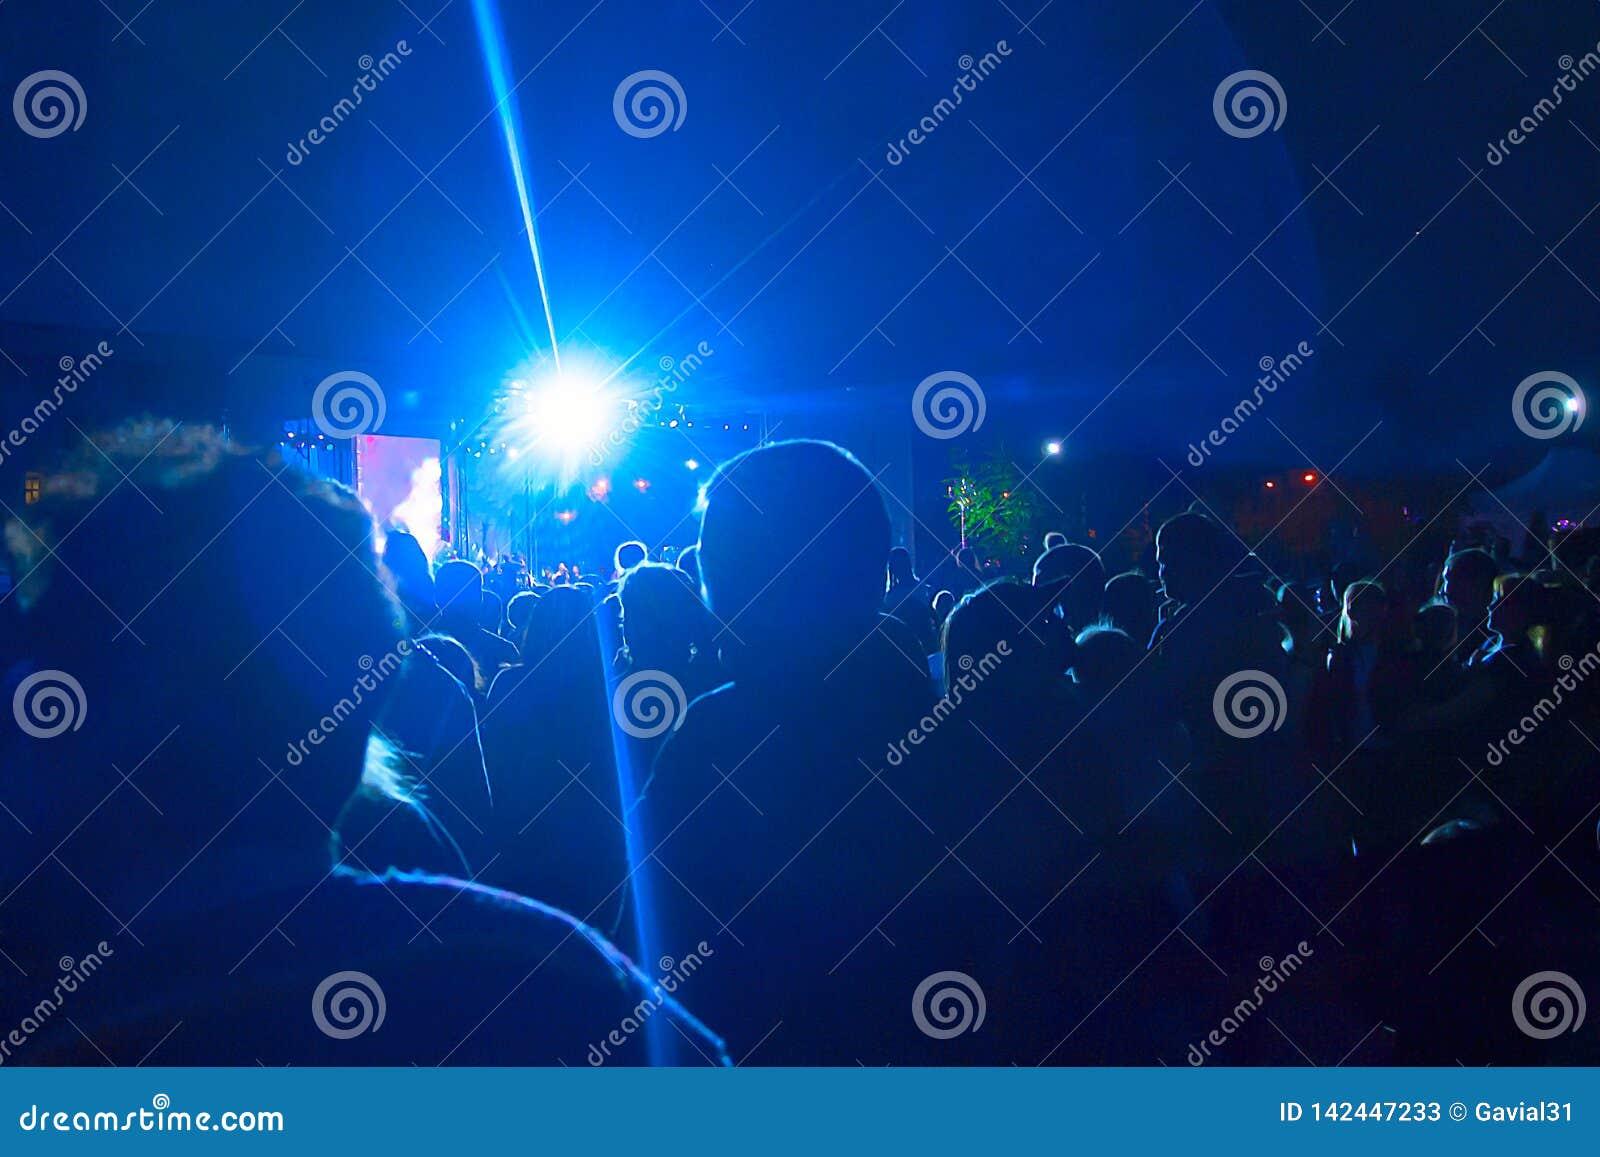 Konturer av ett stort antal folk på bakgrunden av strålkastare Begrepp: beröm samlar